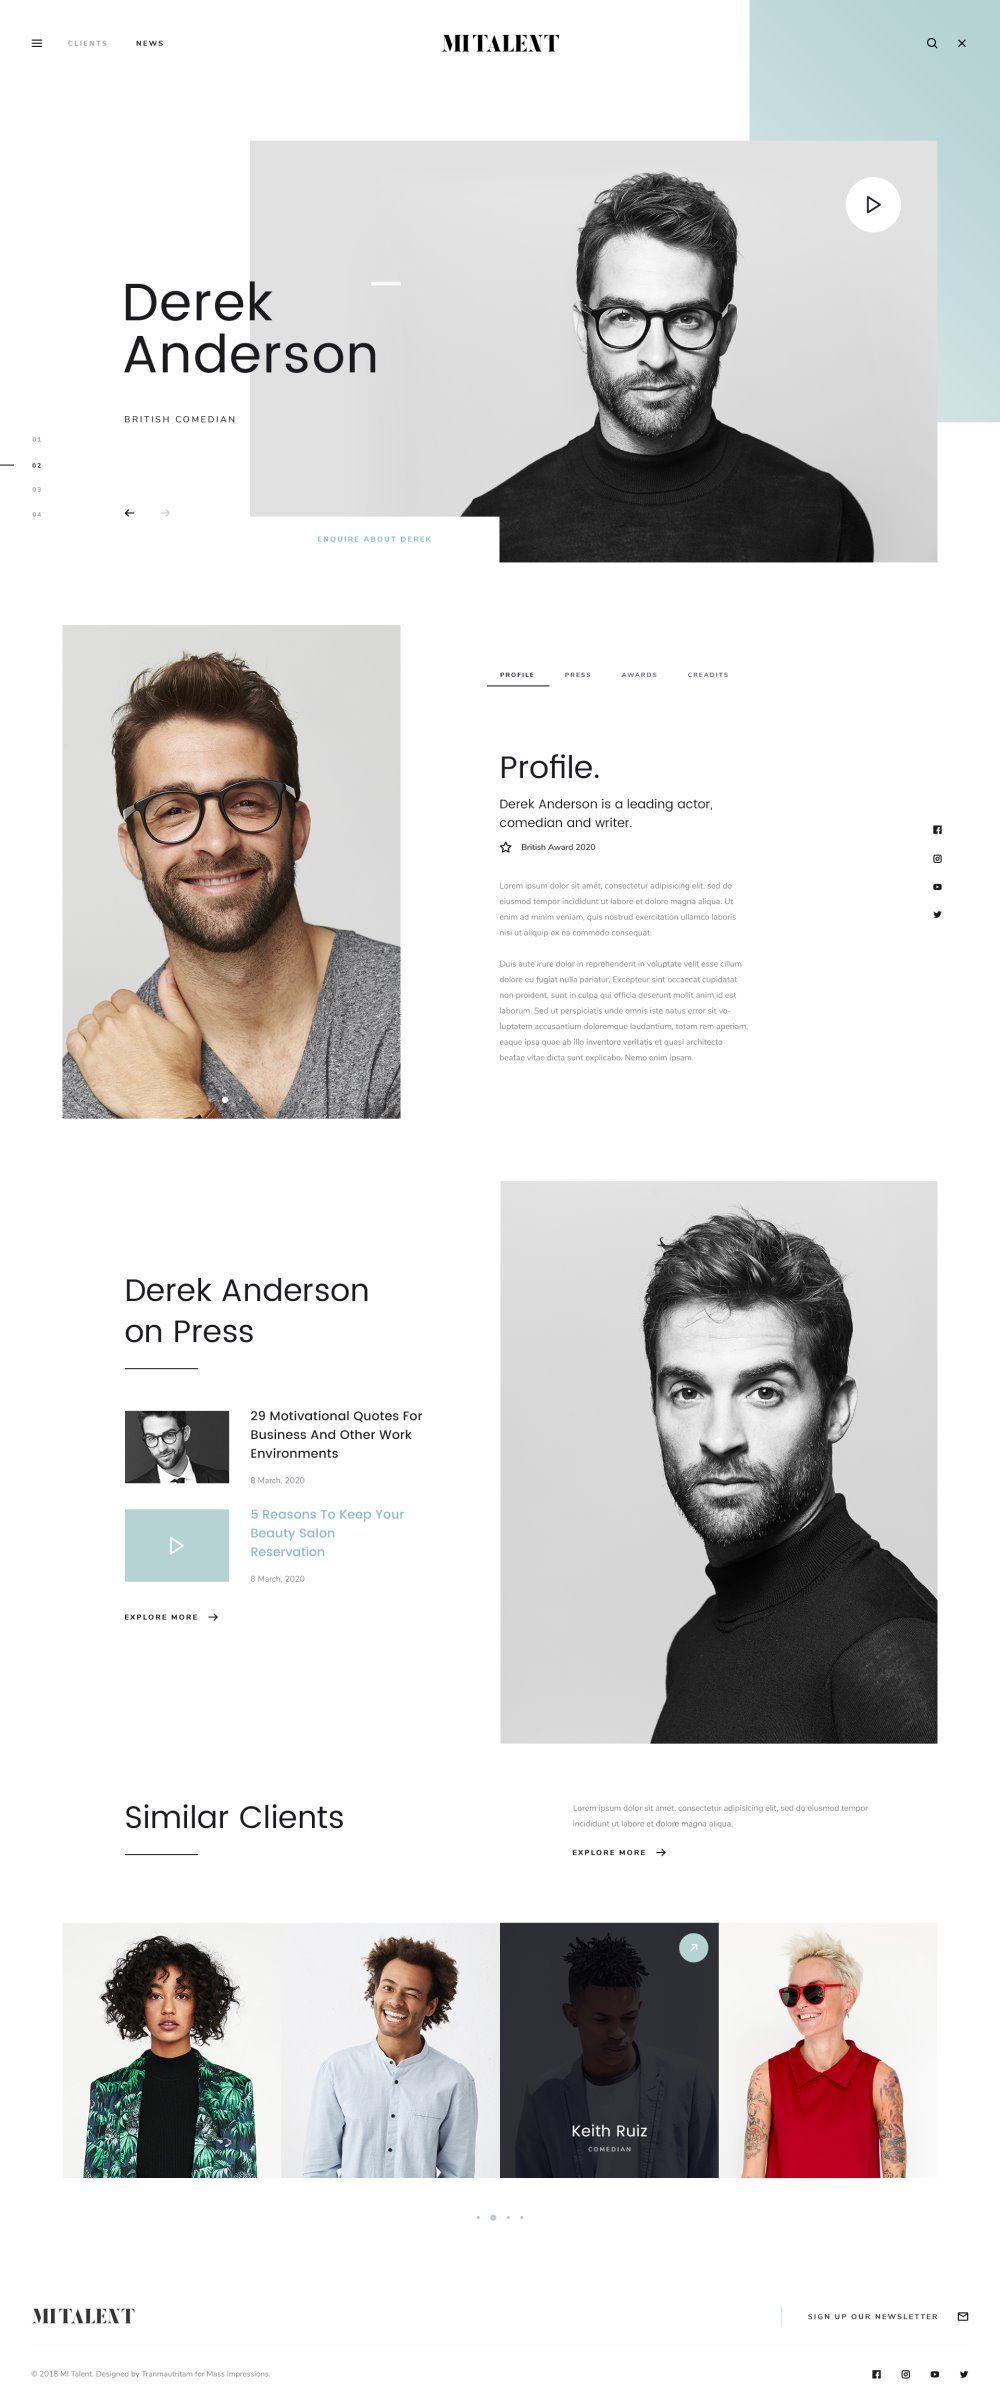 MI Talent - Free Website Template for Agencies | Pinterest ...